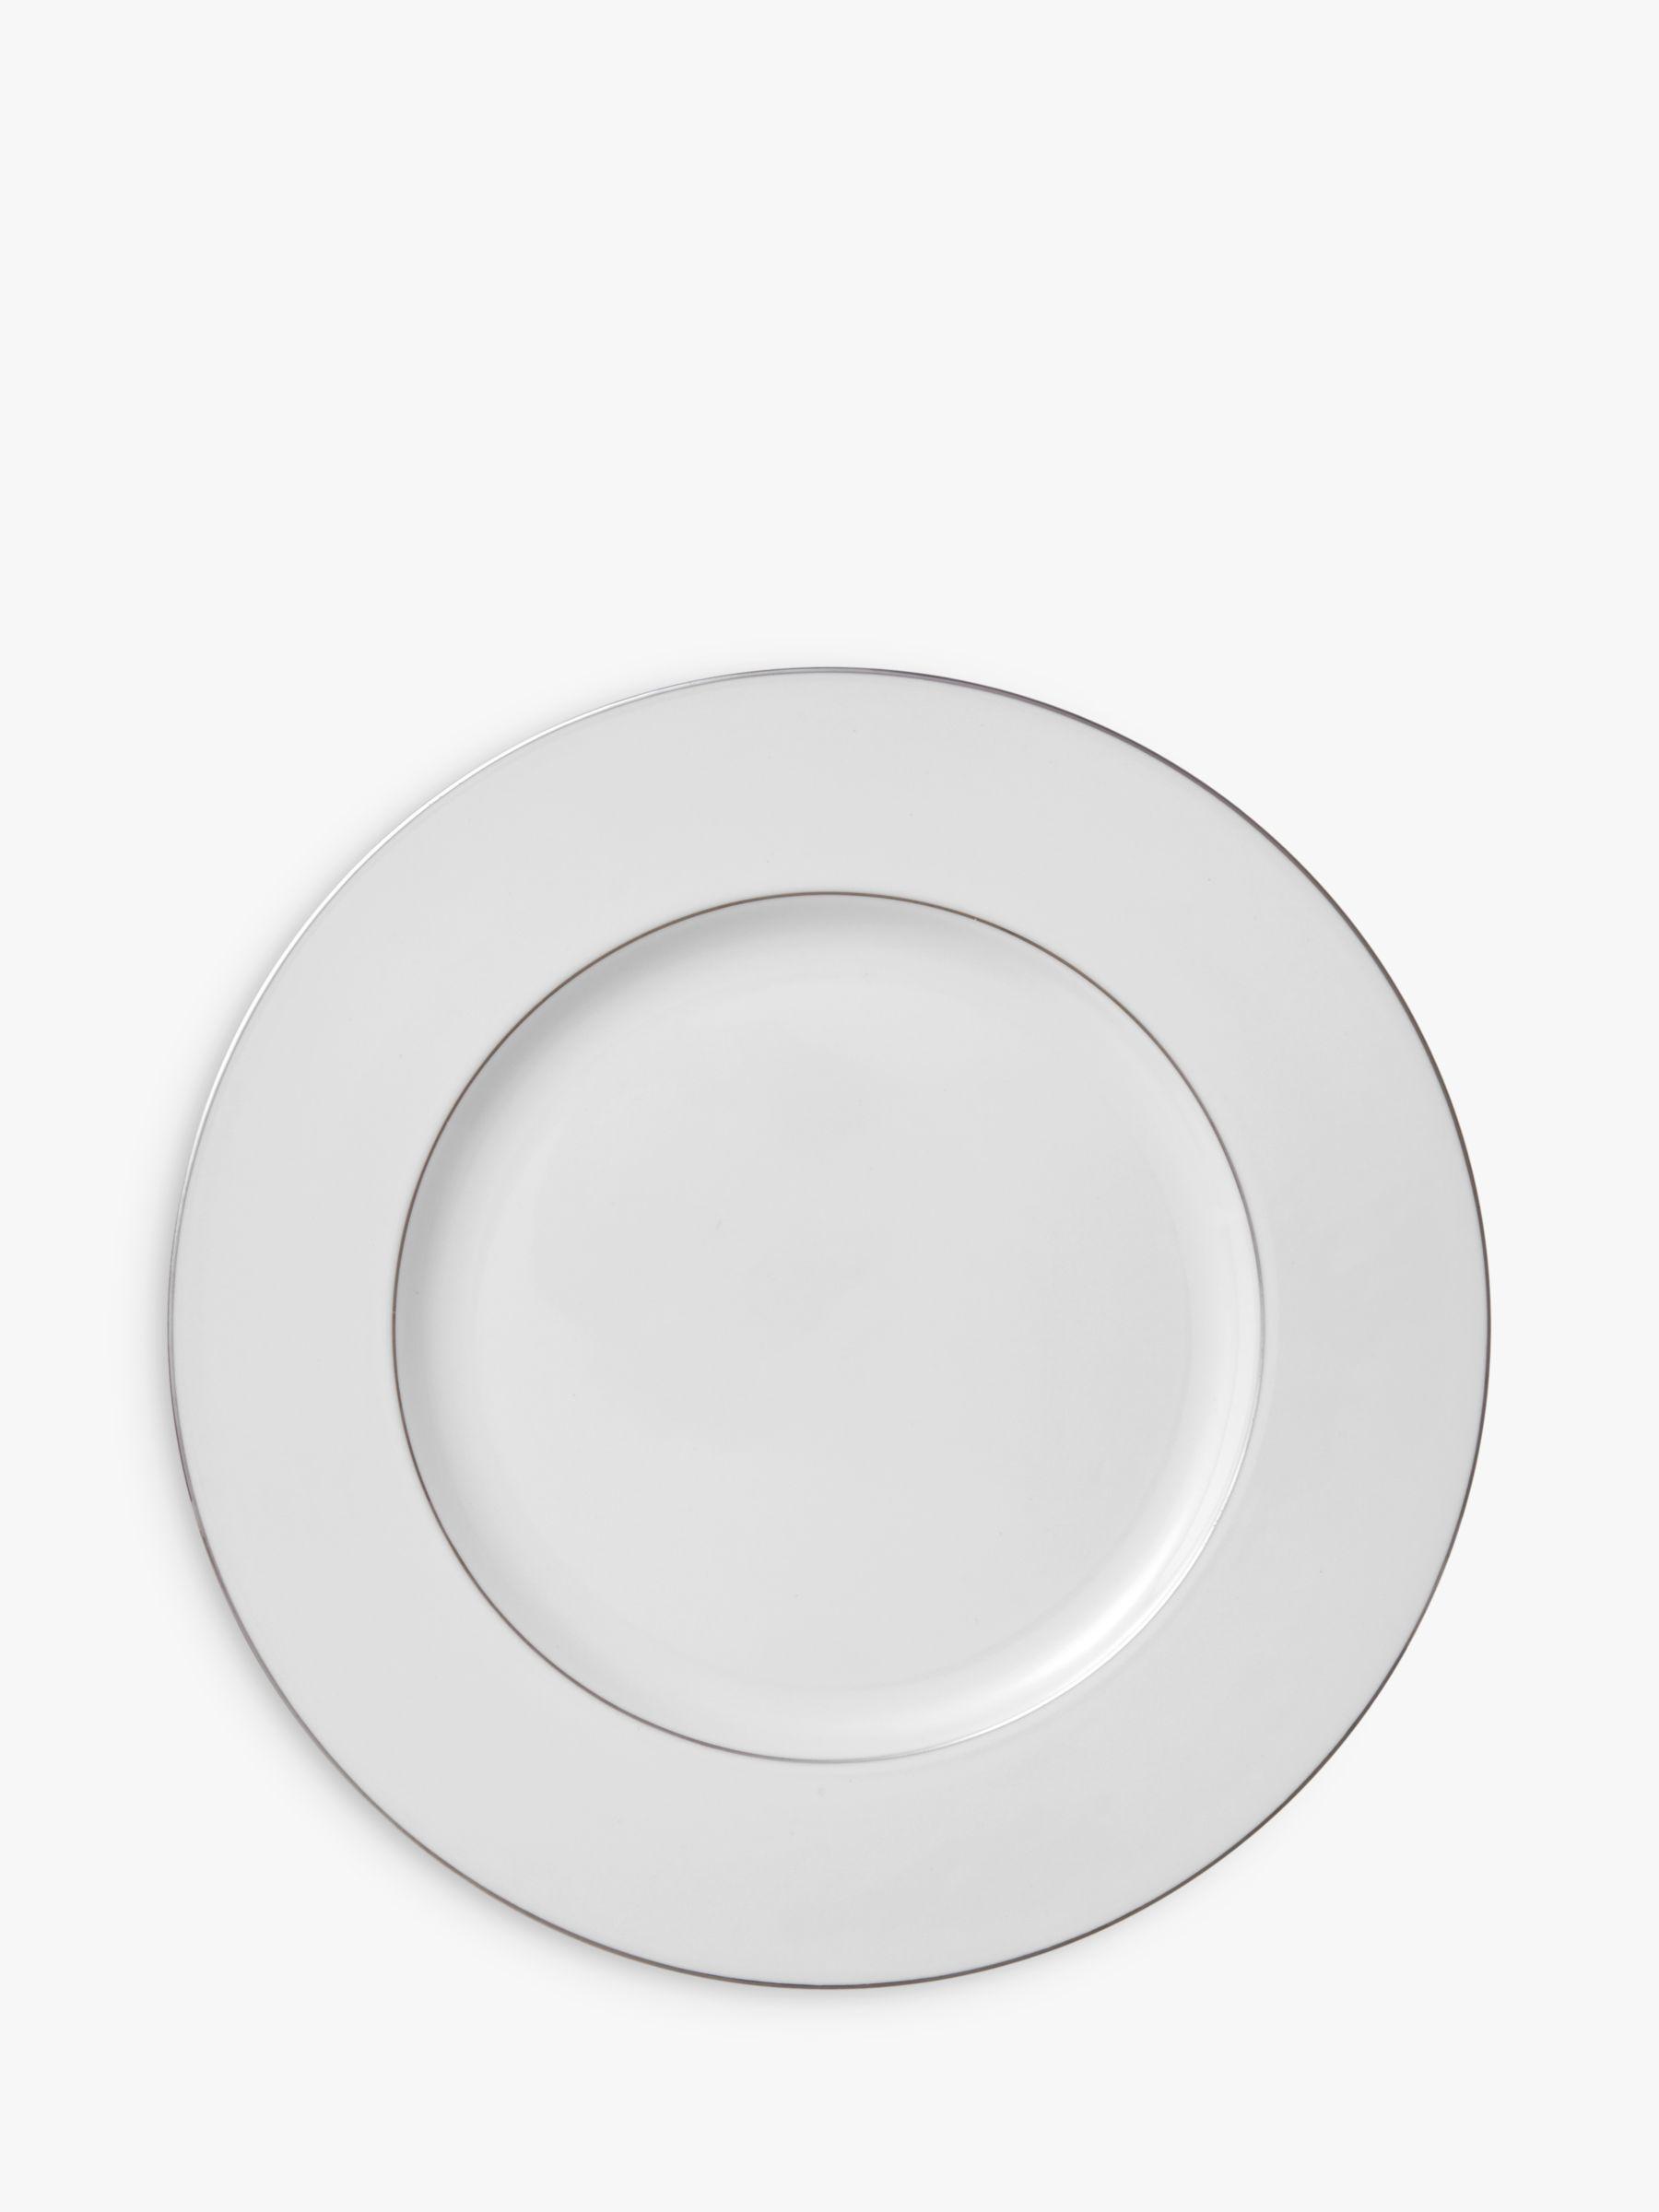 Wedgwood Wedgwood Signet Platinum Dinner Plate, Dia.27cm, White